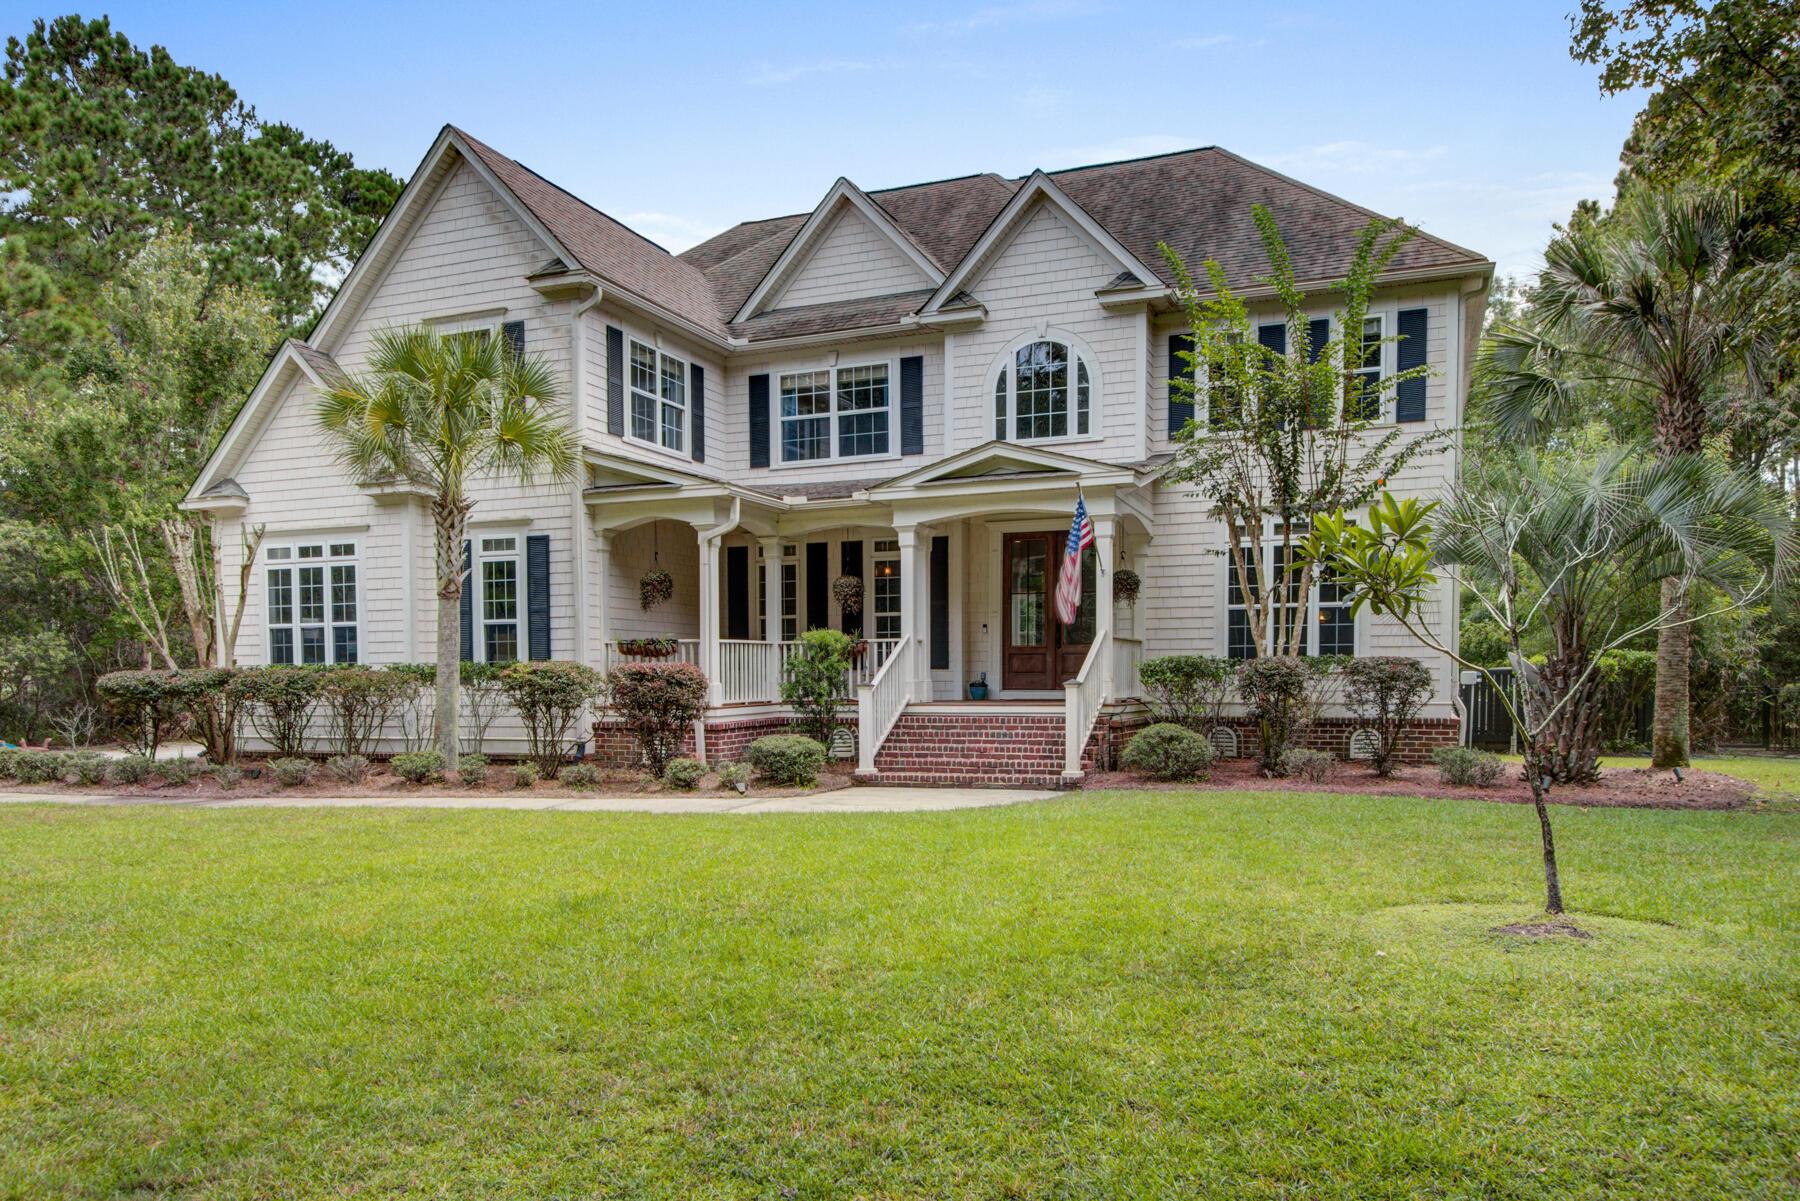 Dunes West Homes For Sale - 3095 Pignatelli, Mount Pleasant, SC - 35